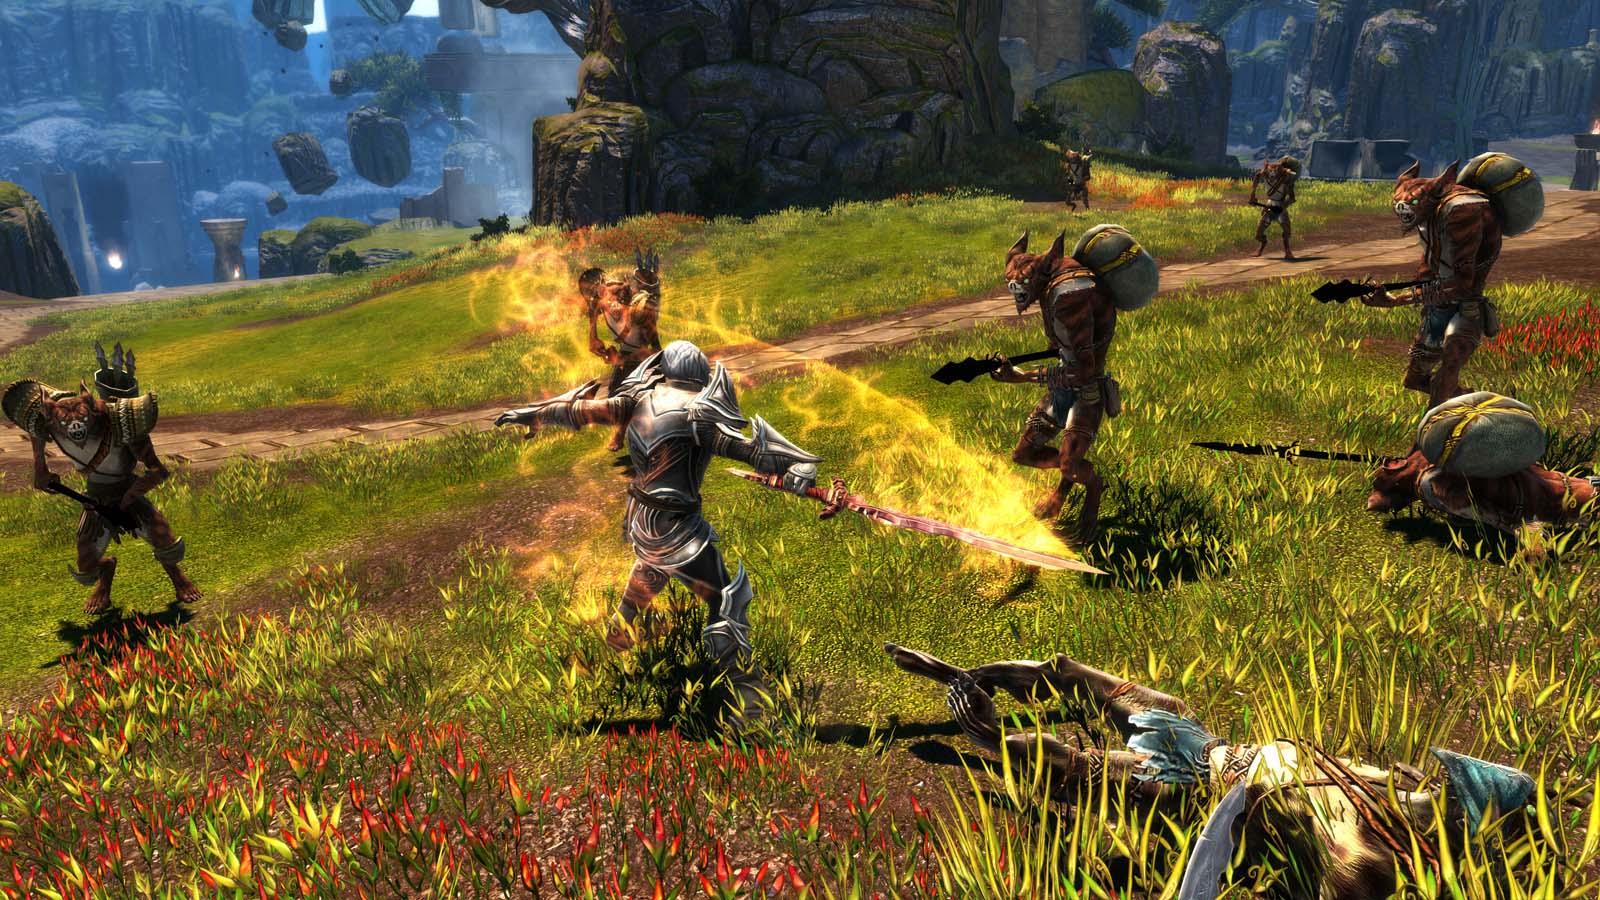 Kingdoms Of Amalur Re-Reckoning Review (PlayStation 4)